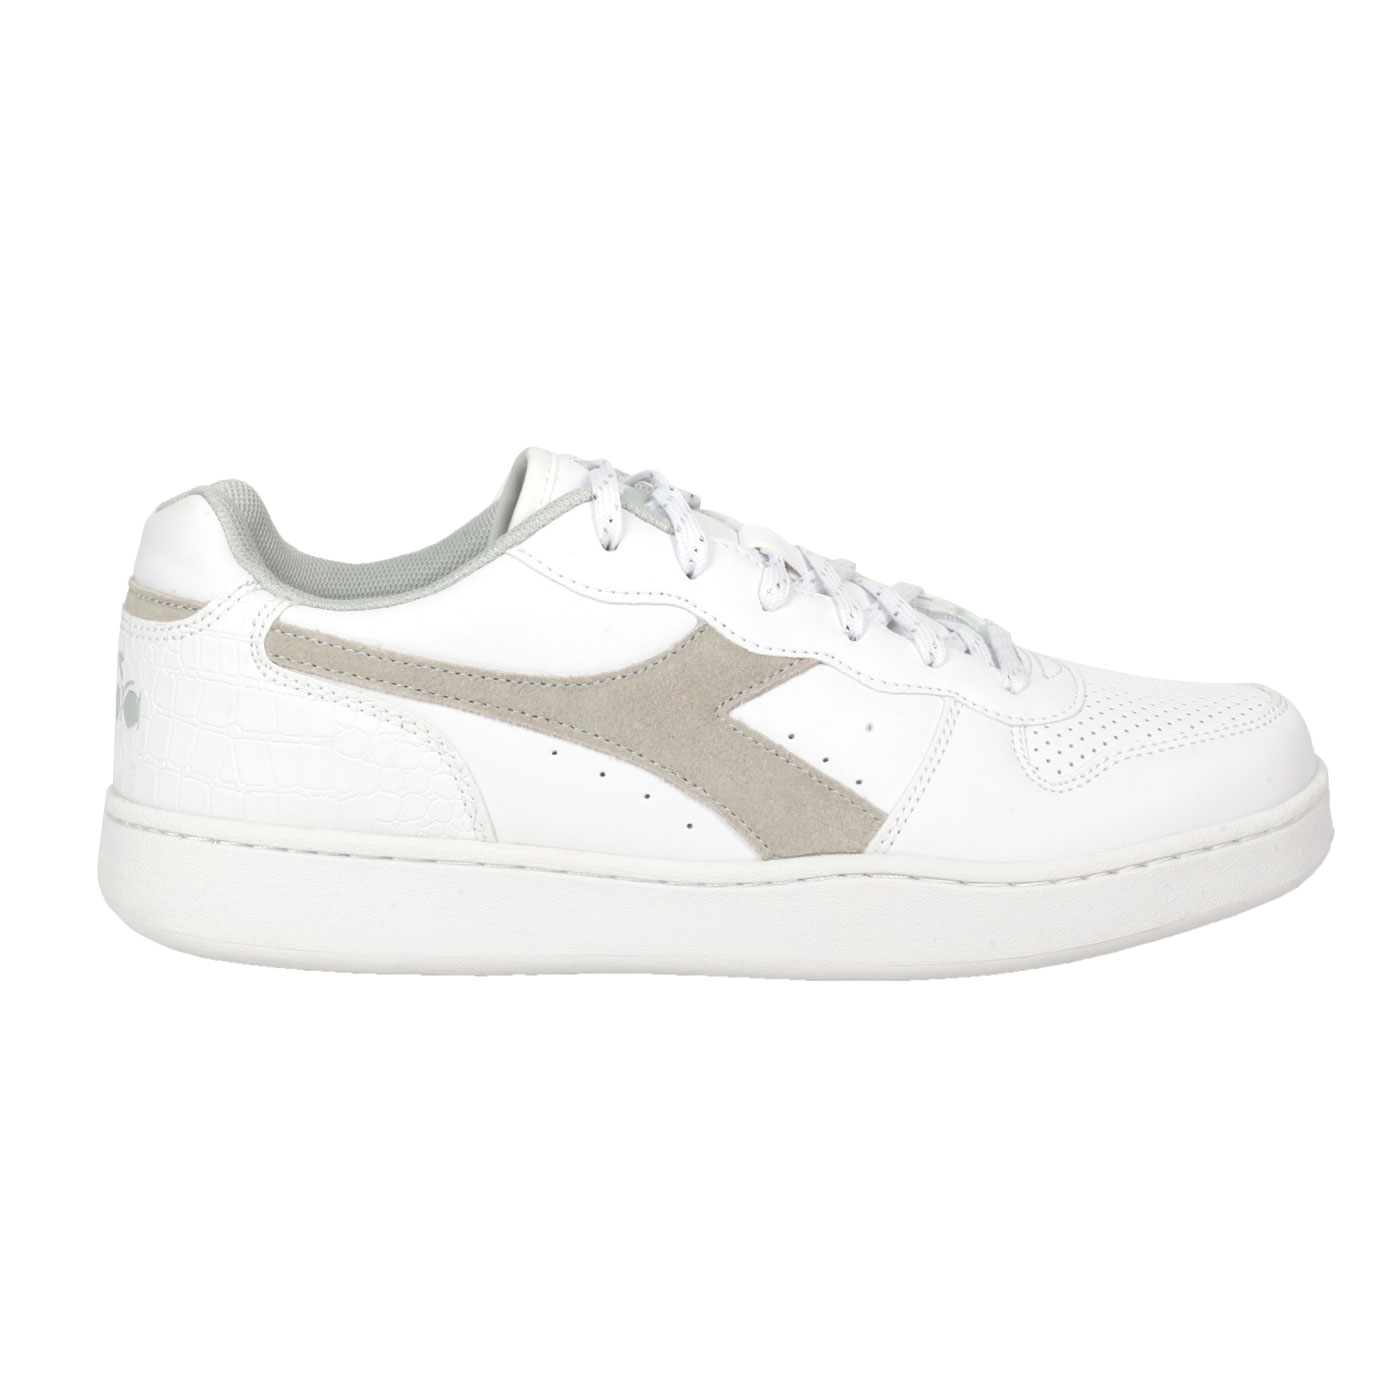 DIADORA 女款進口復古網球鞋 DA176999-C0341